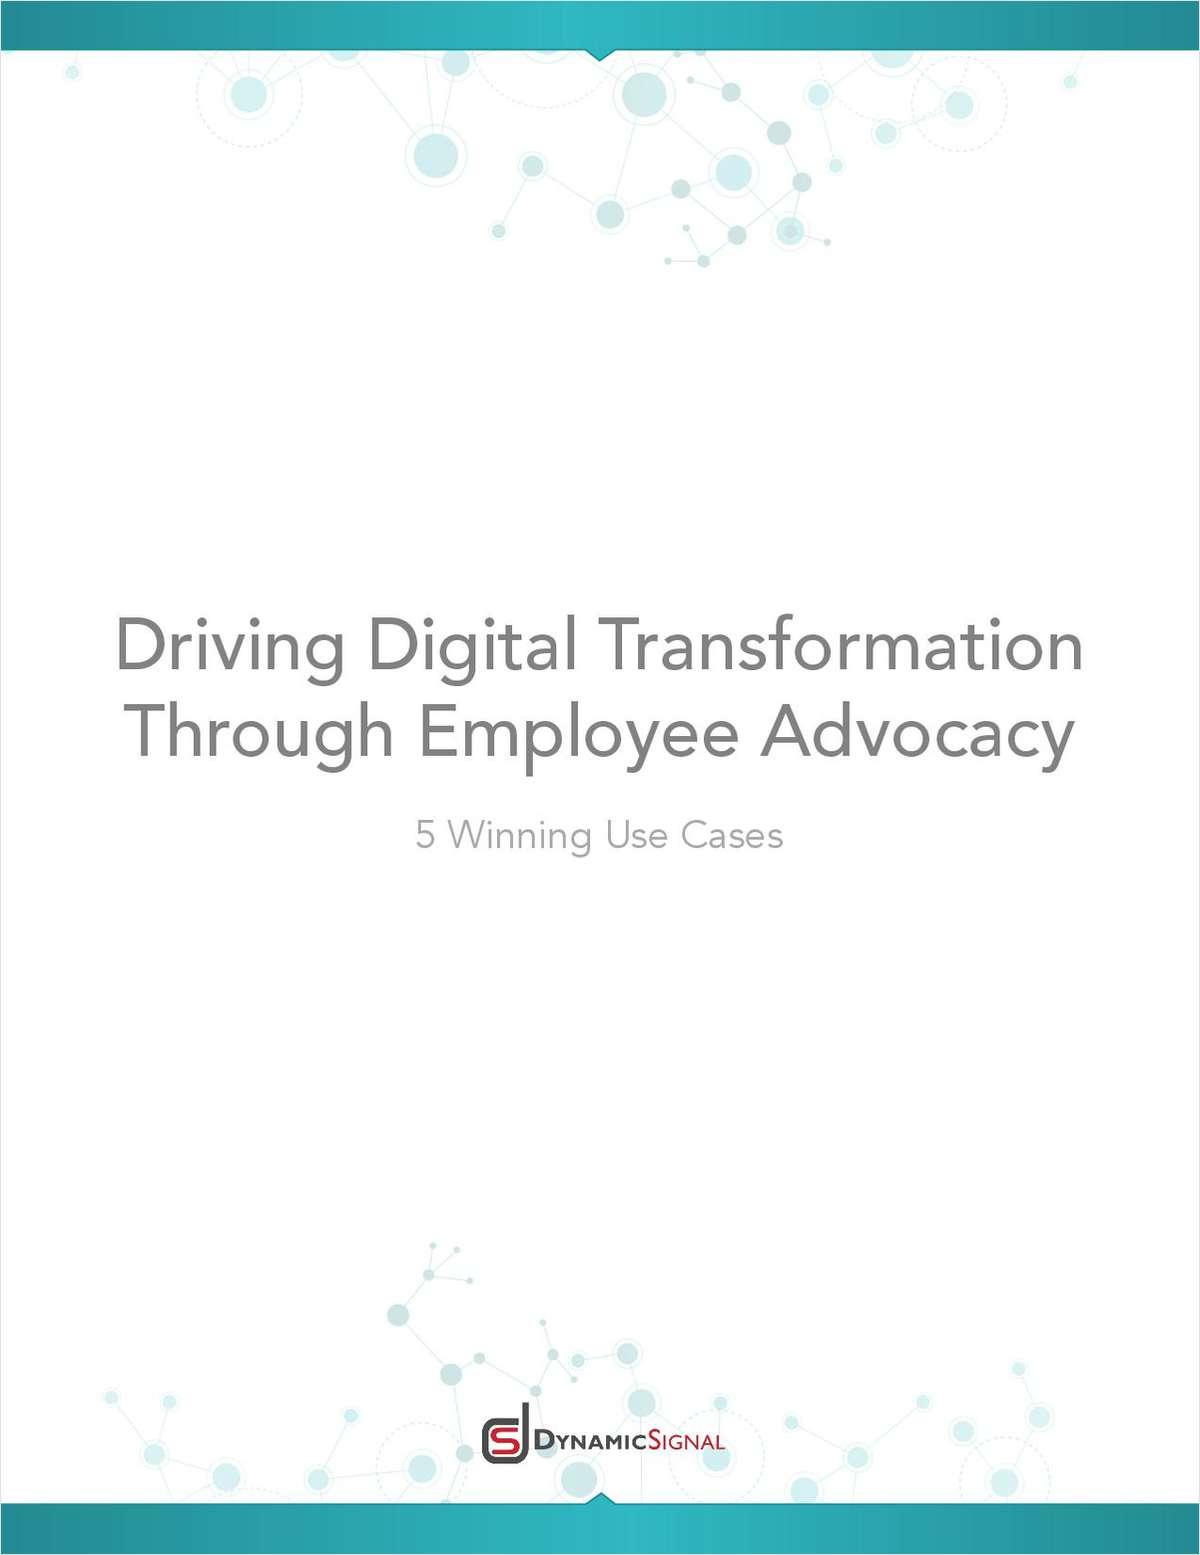 Driving Digital Transformation Through Employee Advocacy